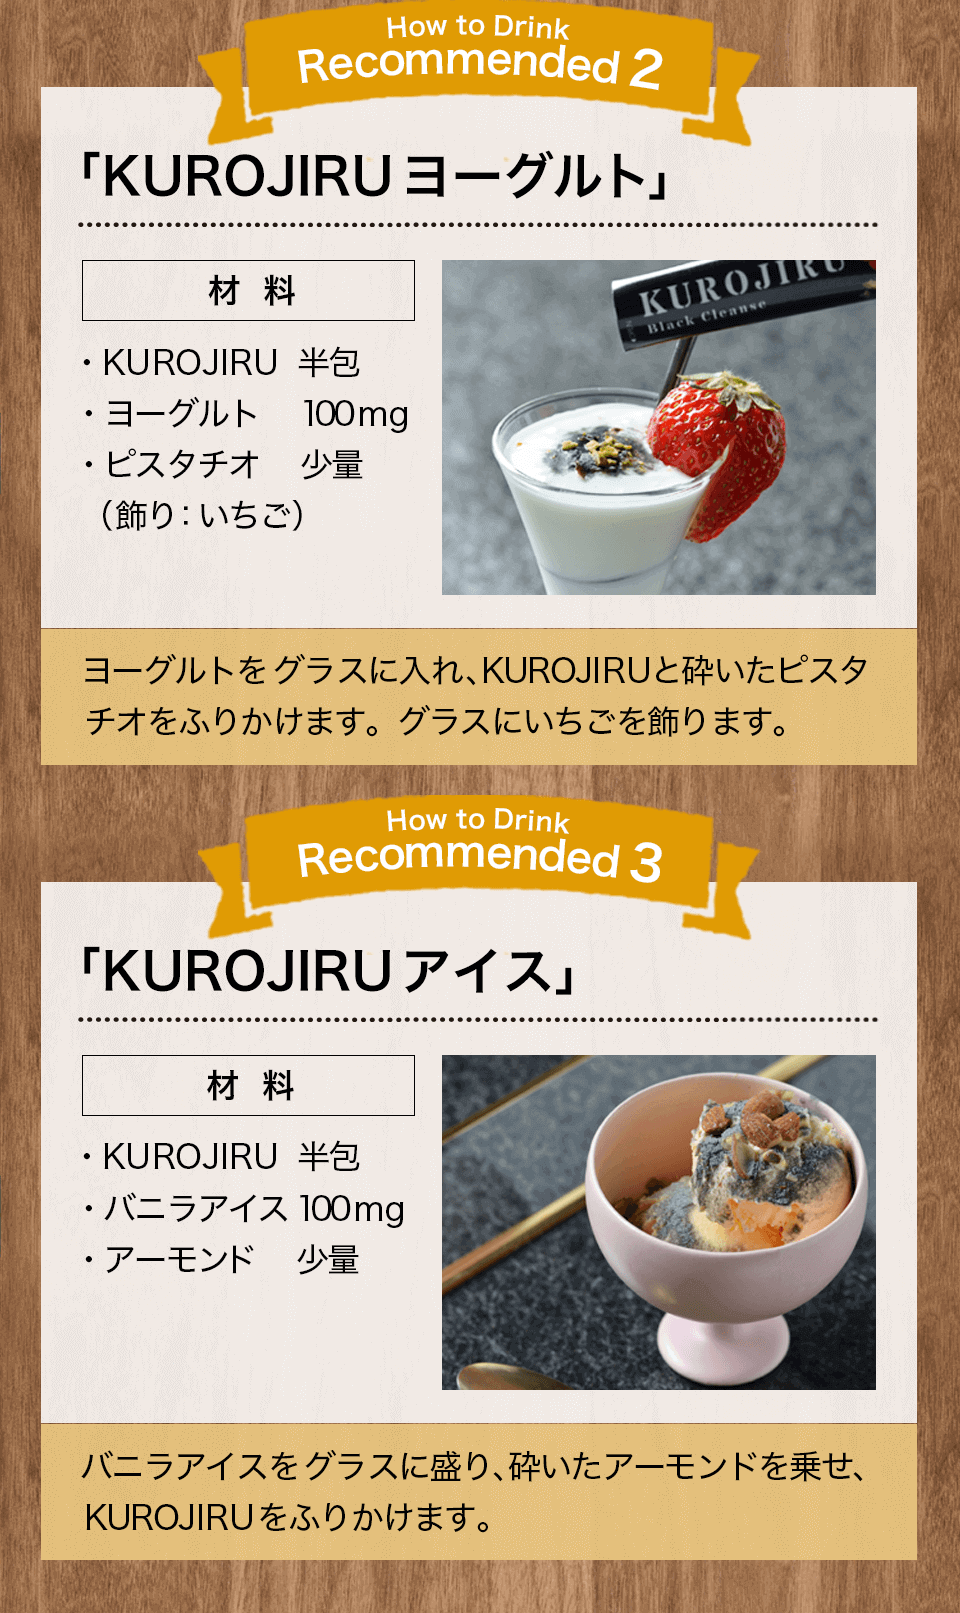 KUROJIRUヨーグルトの作り方 KUROJIRUアイスの作り方